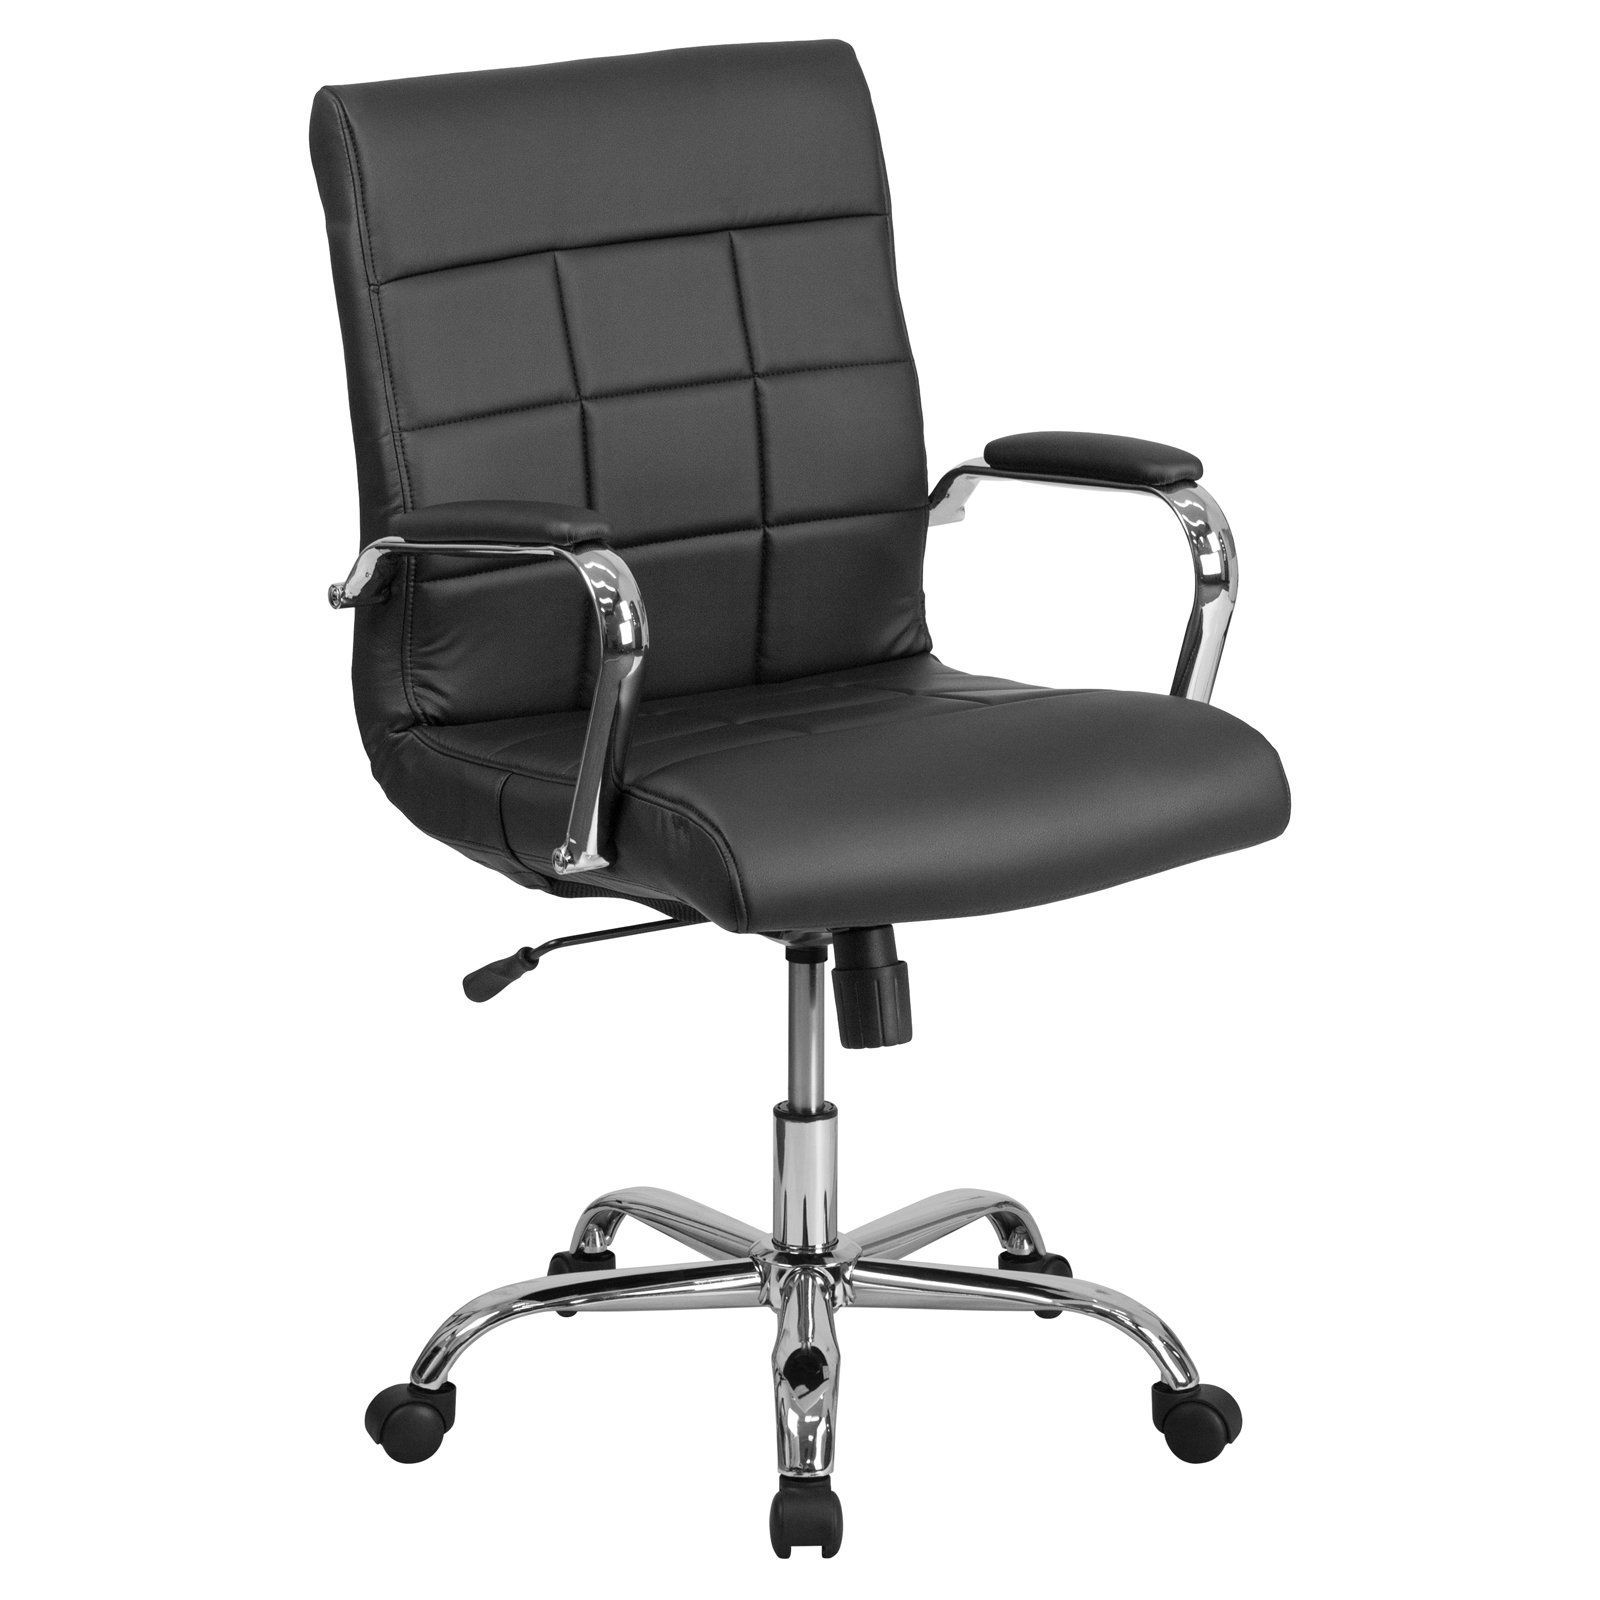 Astounding Flash Furniture Mid Back Vinyl Executive Swivel Office Chair Home Interior And Landscaping Ponolsignezvosmurscom